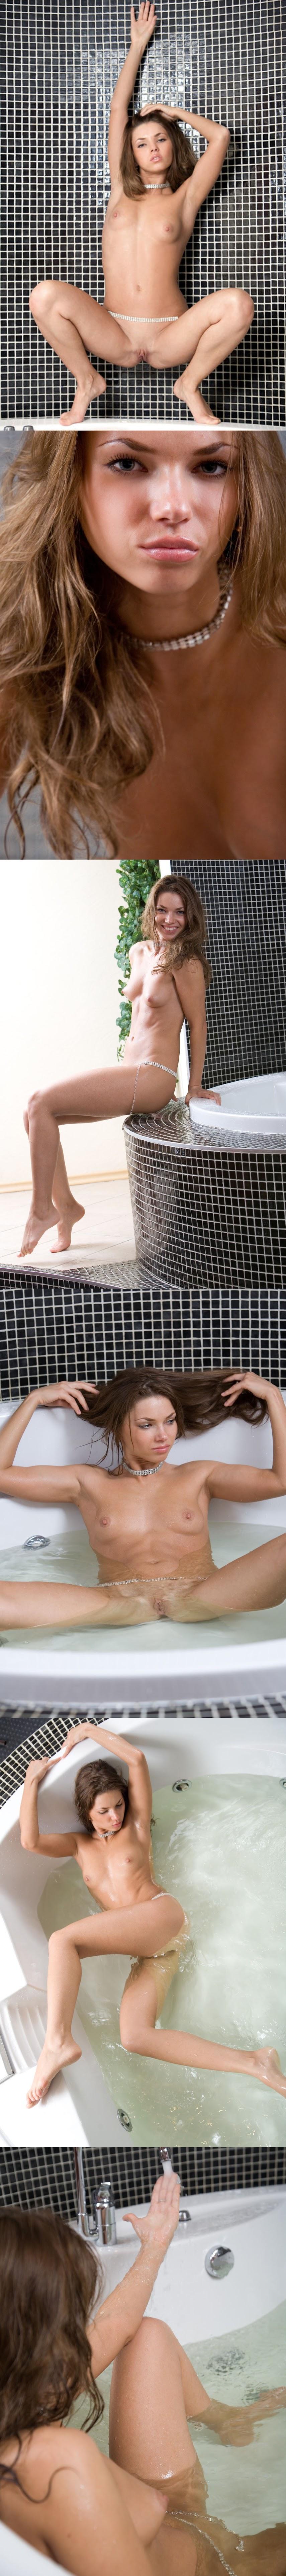 Met-Art MA 20081230 - Adriana D - Ventuno - by Rylsky